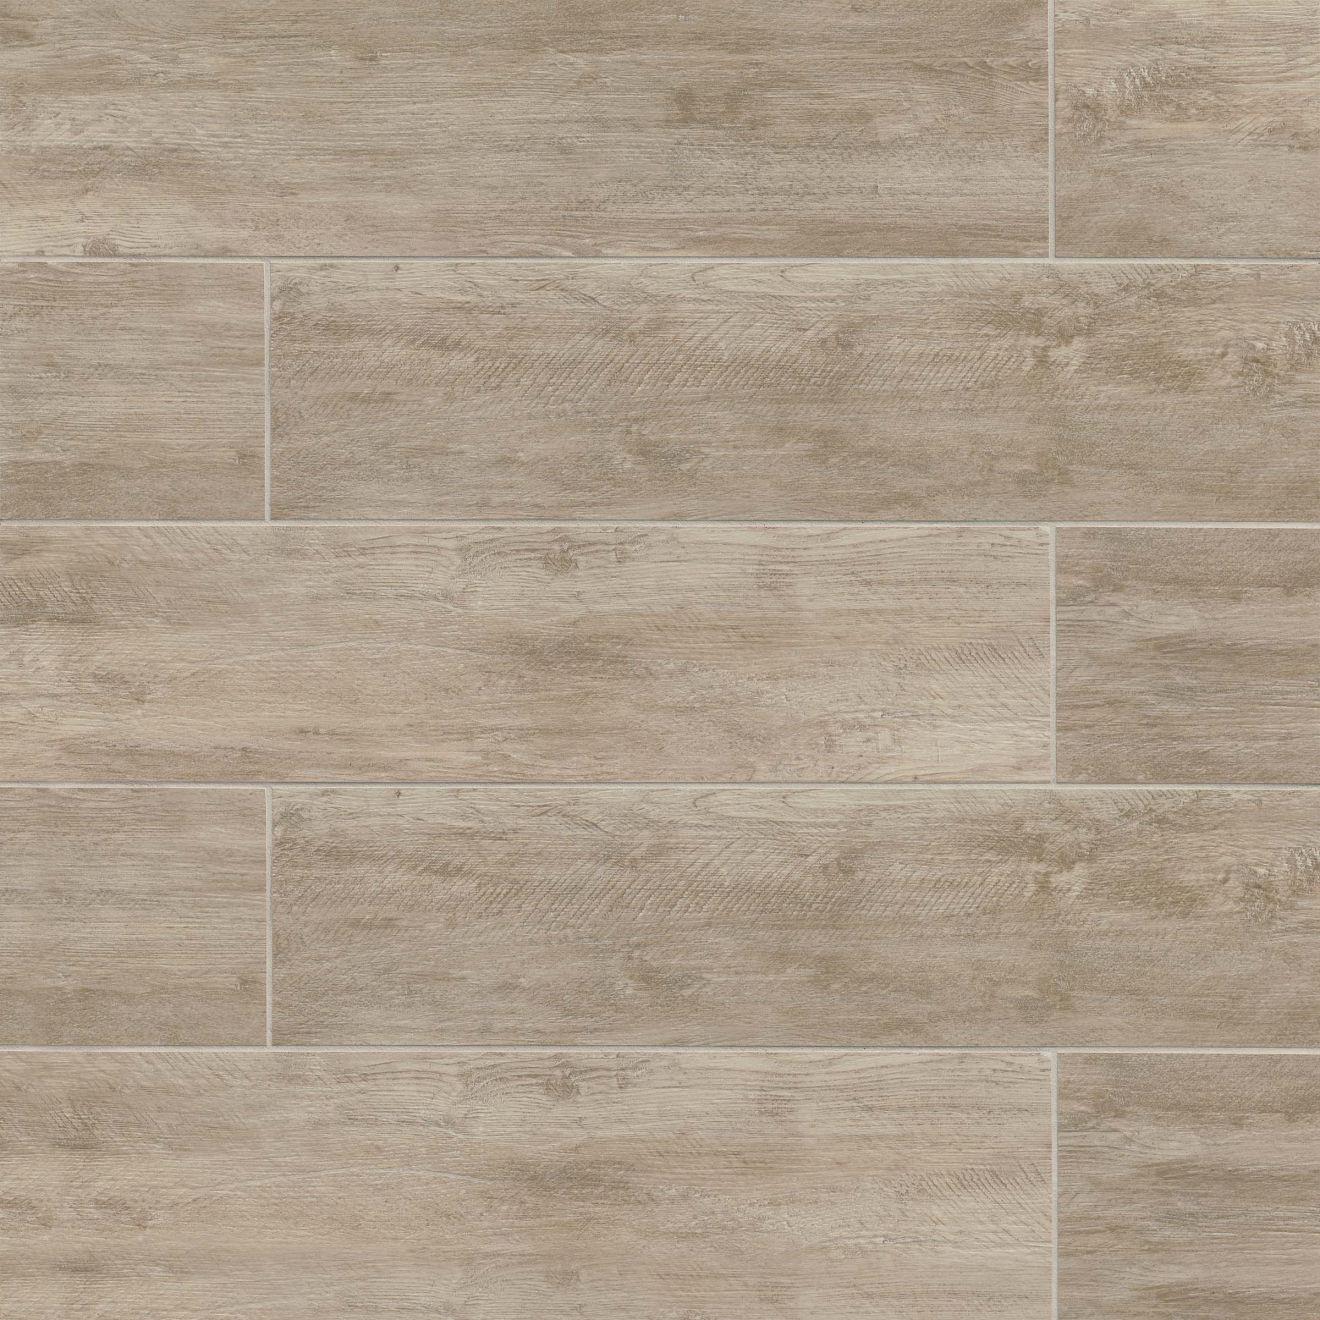 River Wood 8 Quot X 36 Quot Floor Amp Wall Tile In Oak Bedrosians